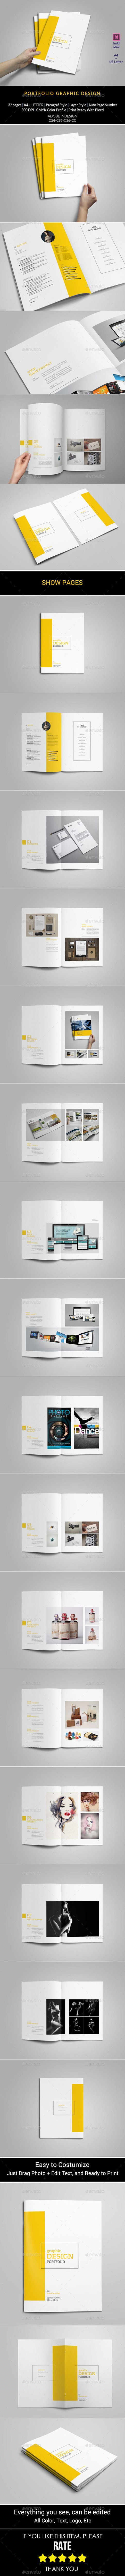 Portfolio Brochure Template #design Download: http://graphicriver.net/item/portfolio-template/11443401?ref=ksioks